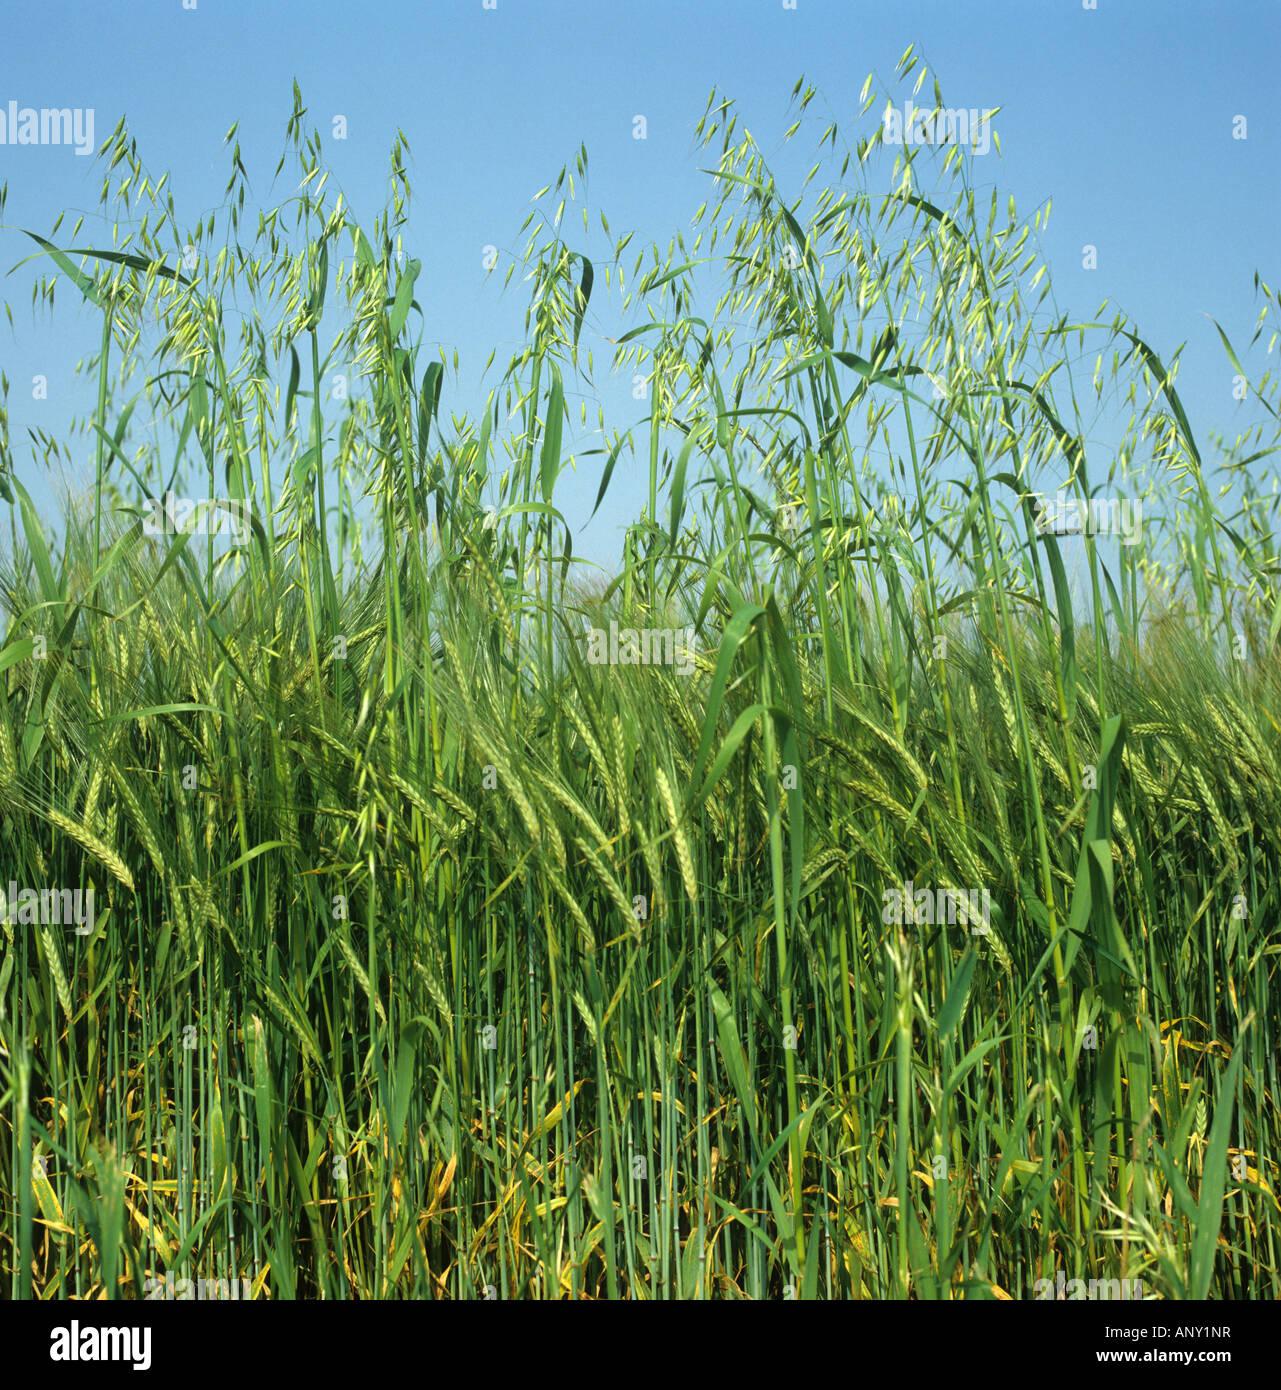 Wild oats Avena fatua annual arable grass weed flower spikes in barley crop in green ear Stock Photo